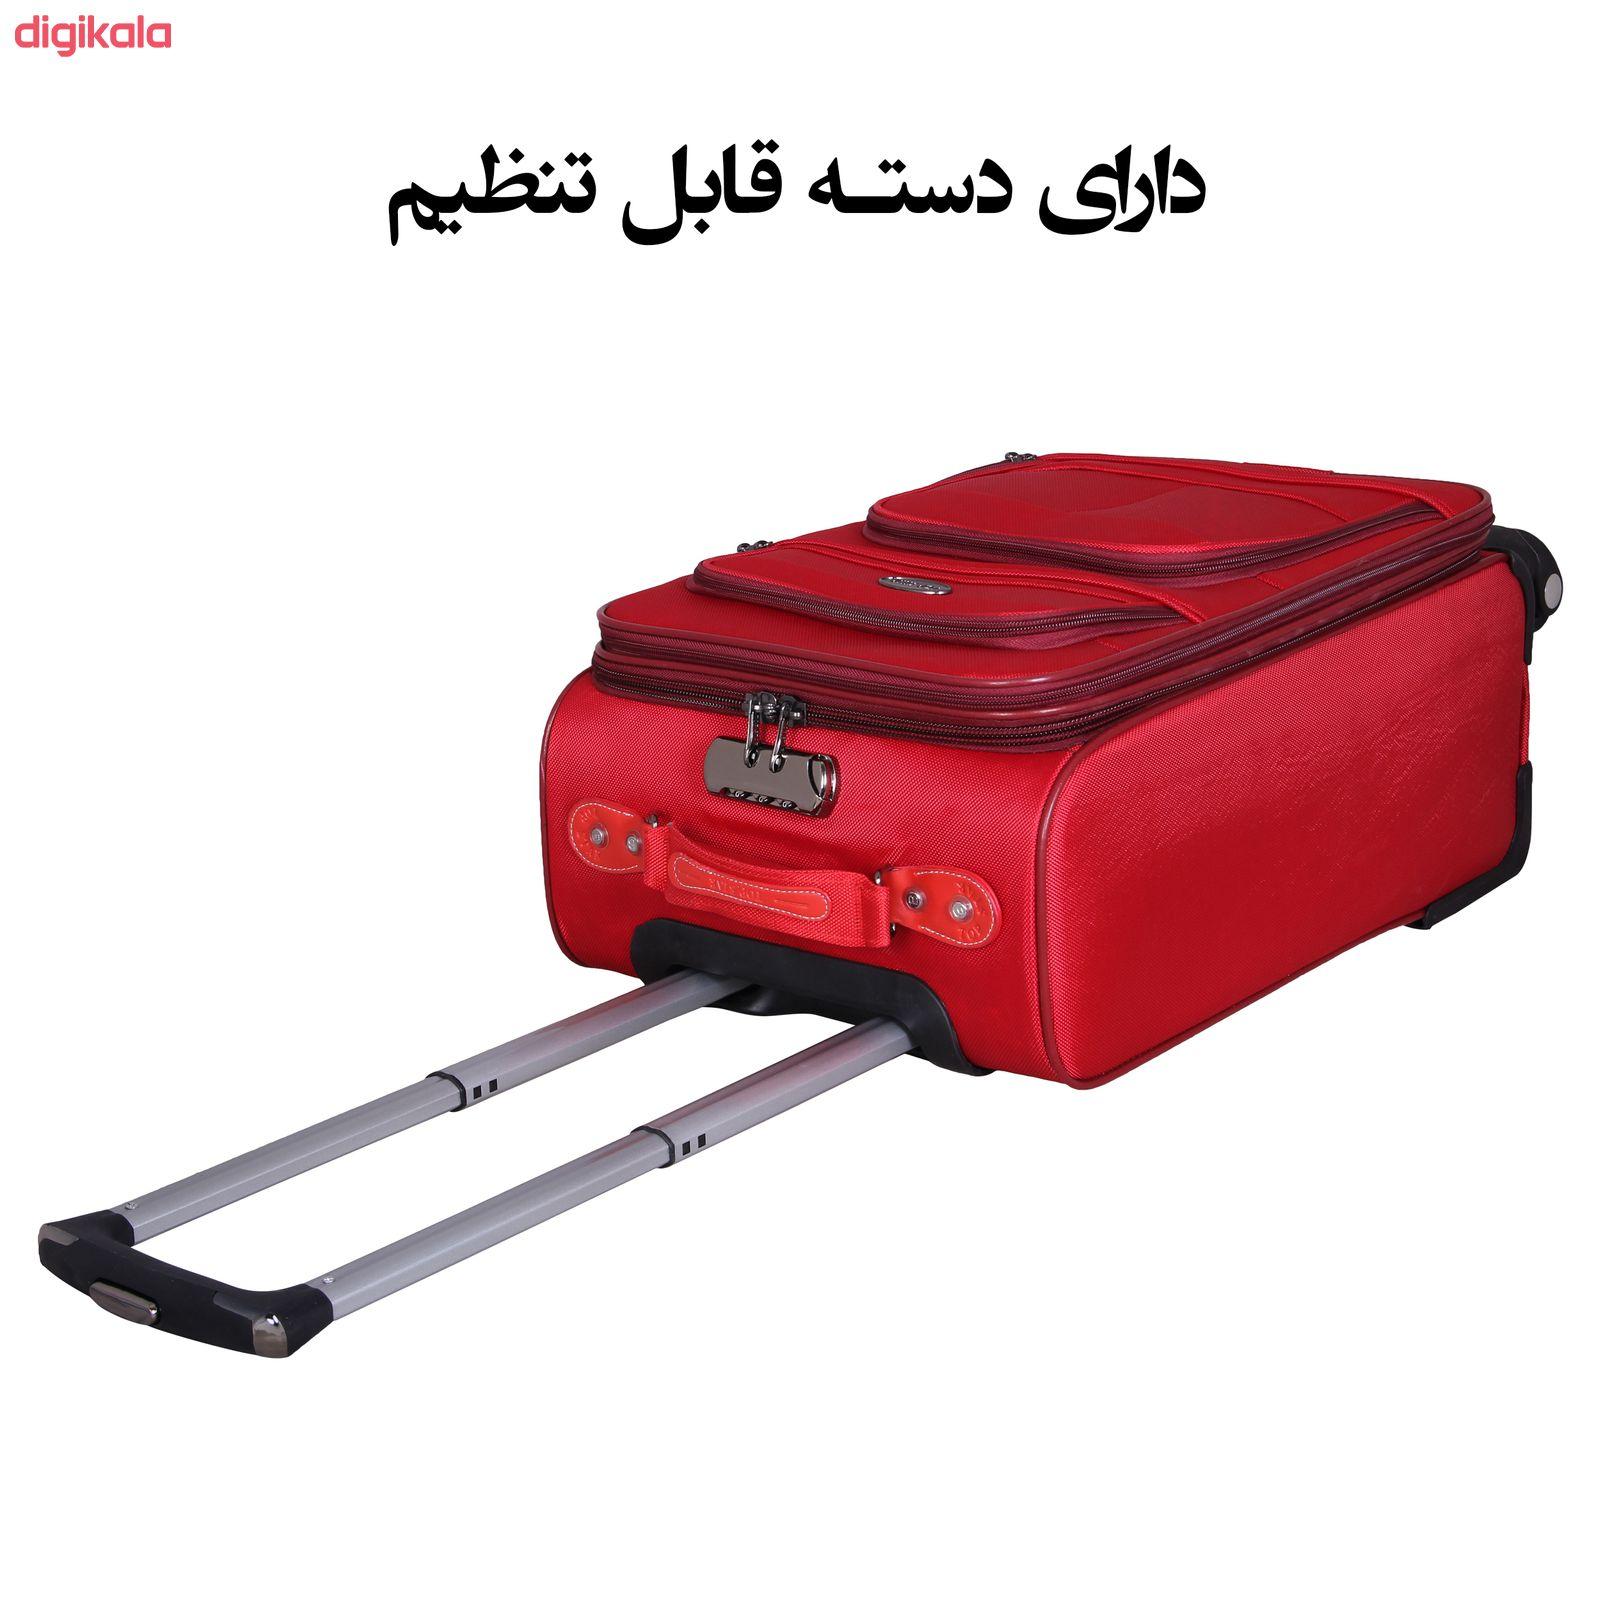 مجموعه سه عددی چمدان کدA1034 main 1 16